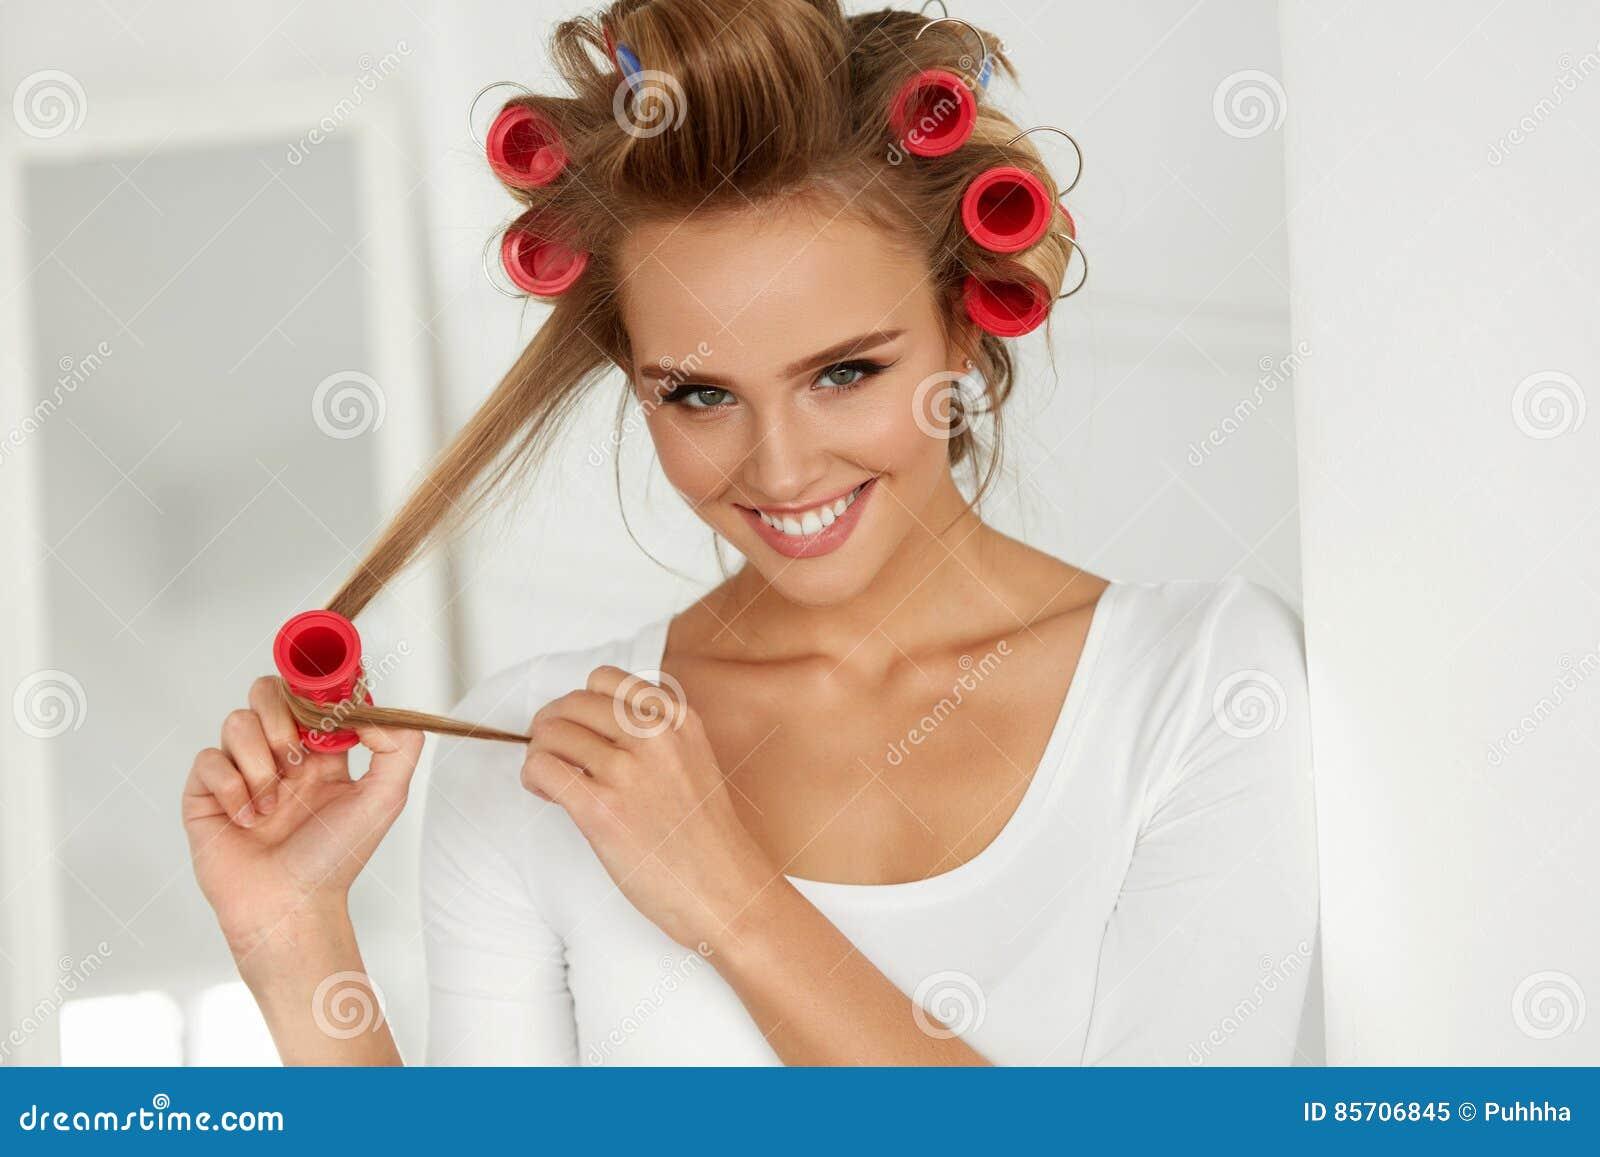 Hair Rollers Woman Hairstyle Hair Curlers Royalty Free